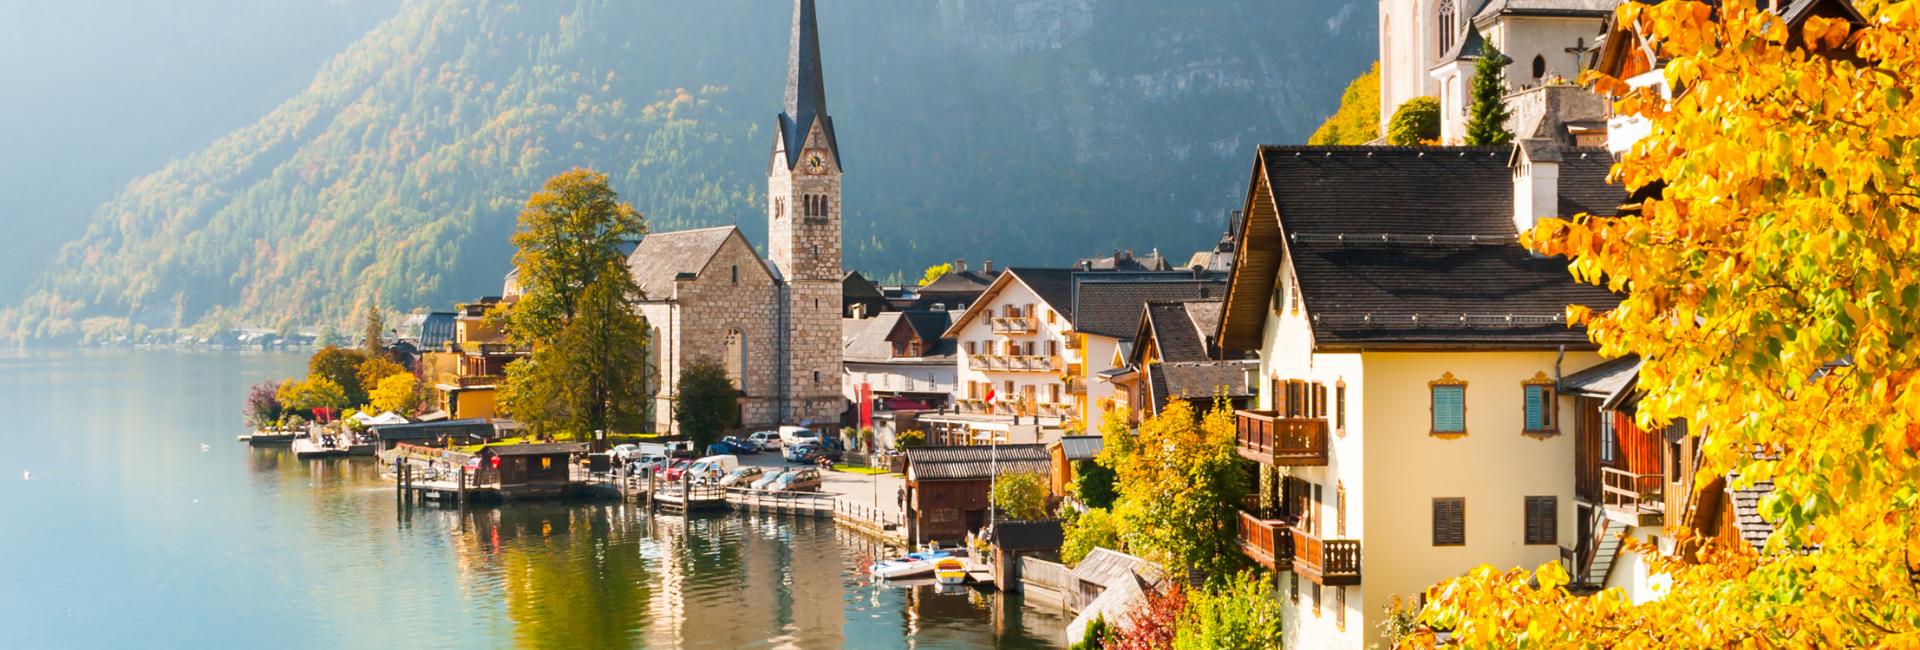 halstatt austria a place to honeymoon in europe